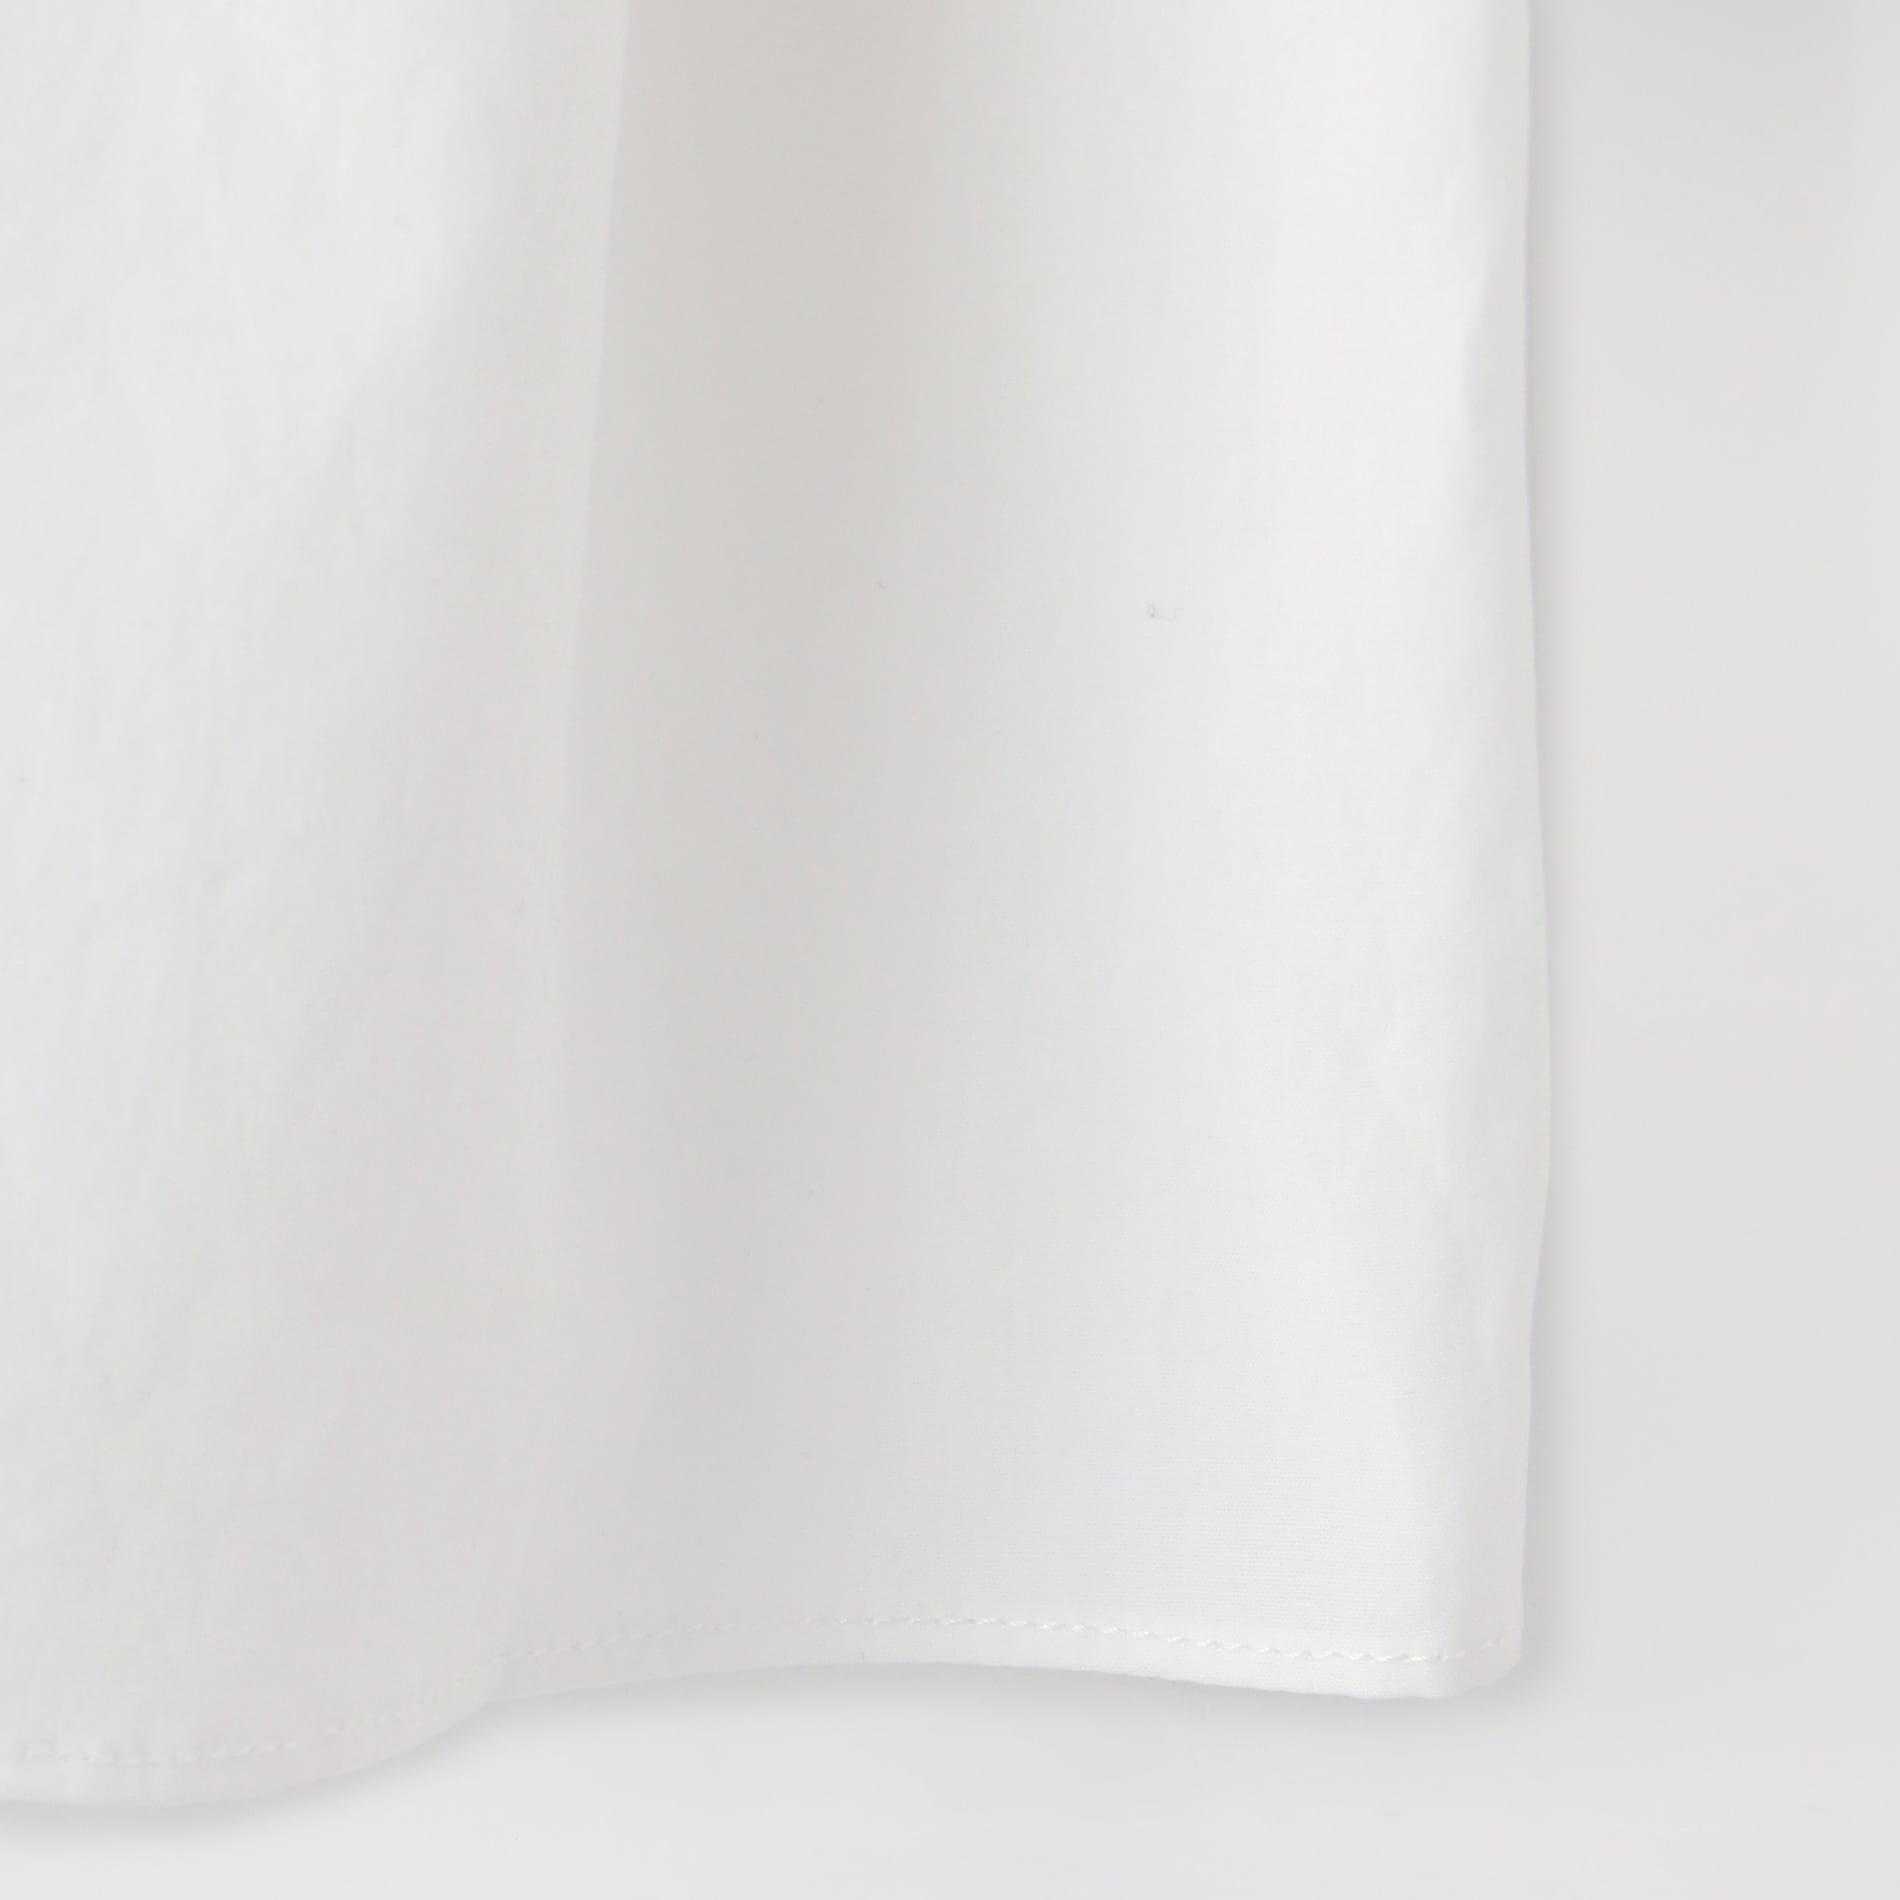 【SAYAKA DAVIS】WOMEN WRAP SHIRT LBL15-COL